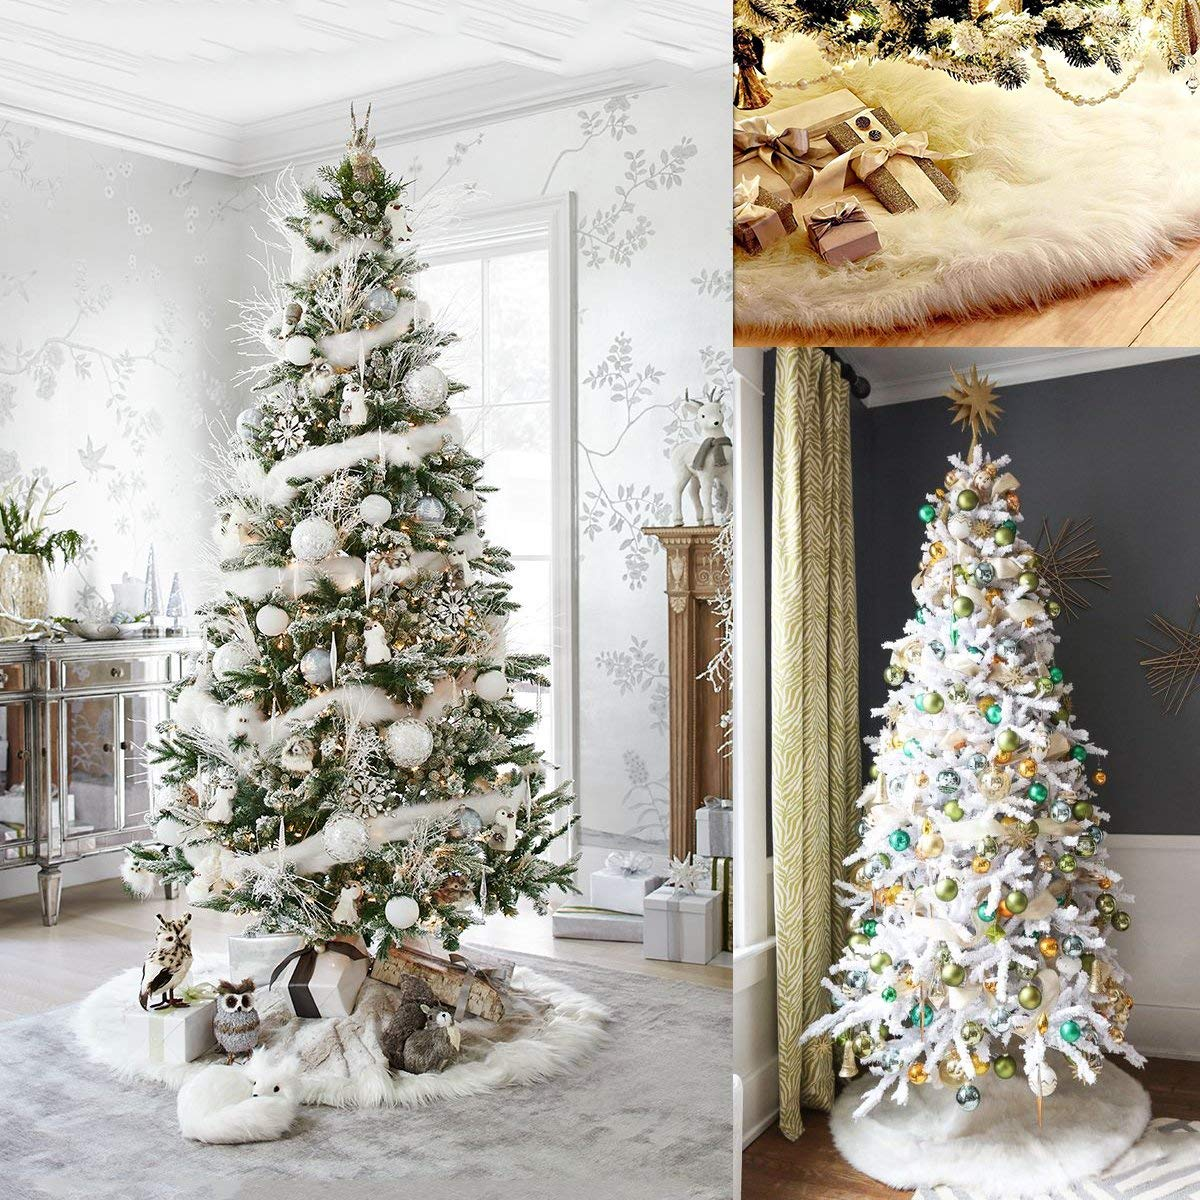 WEKNOWU 122 cm Colore: Bianco Tappetino in Peluche per Albero di Natale